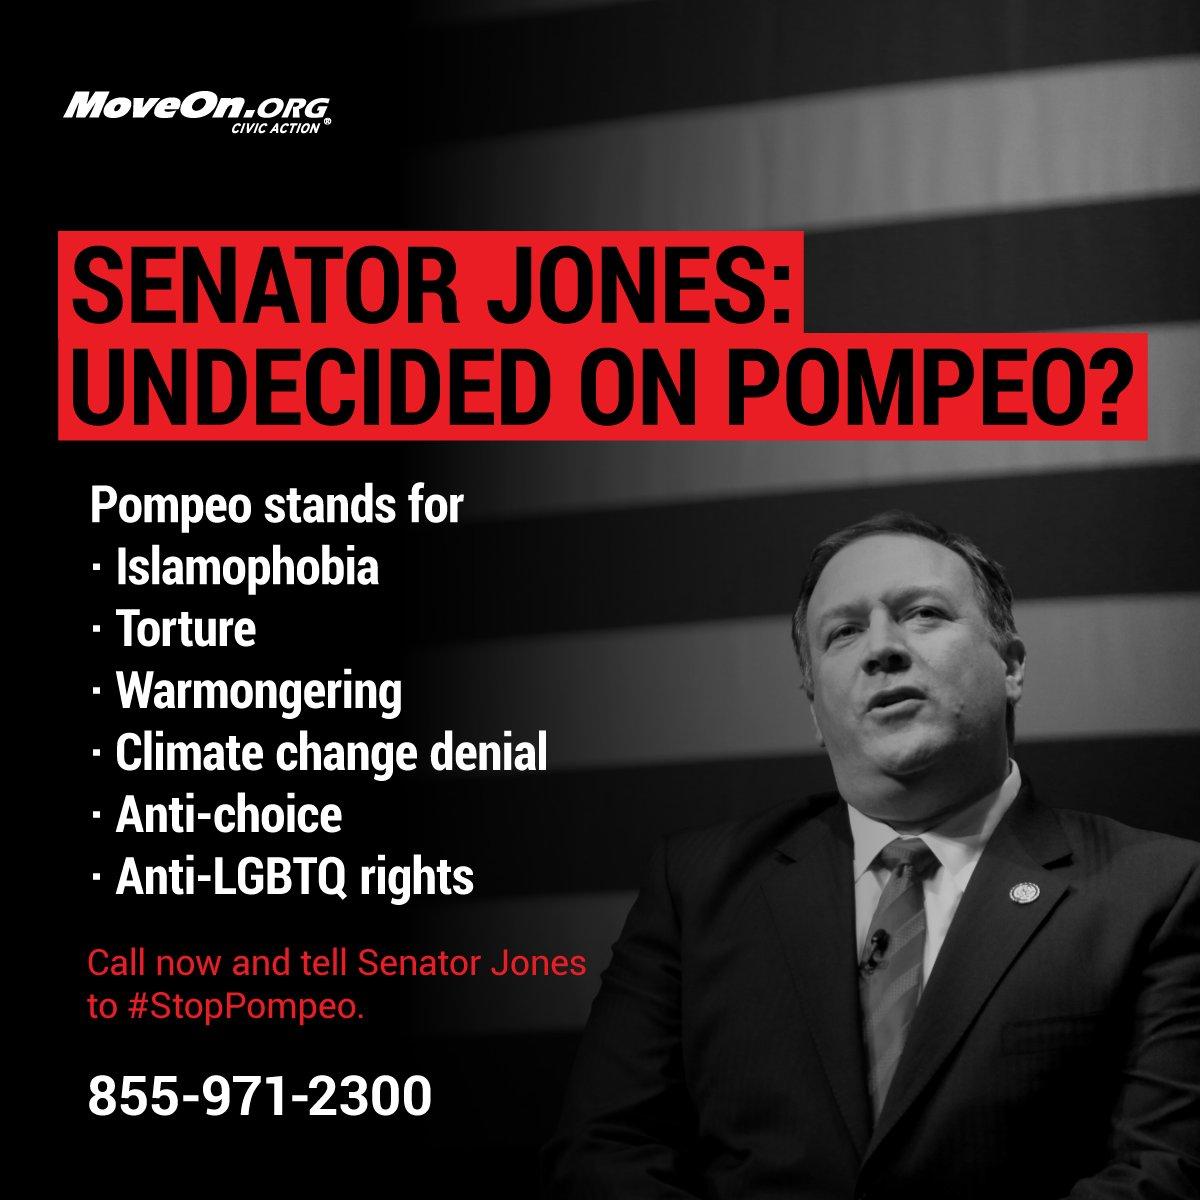 #StopPompeo. @SenDougJones the American people demand better than @realDonaldTrump's #SecOfState nominee. NO anti-Muslim bigot,, water boarders = patriots, Islamophobic rhetoric, attacks #LGBTQ, NO abortion access for rape victims... as chief U.S. diplomat.